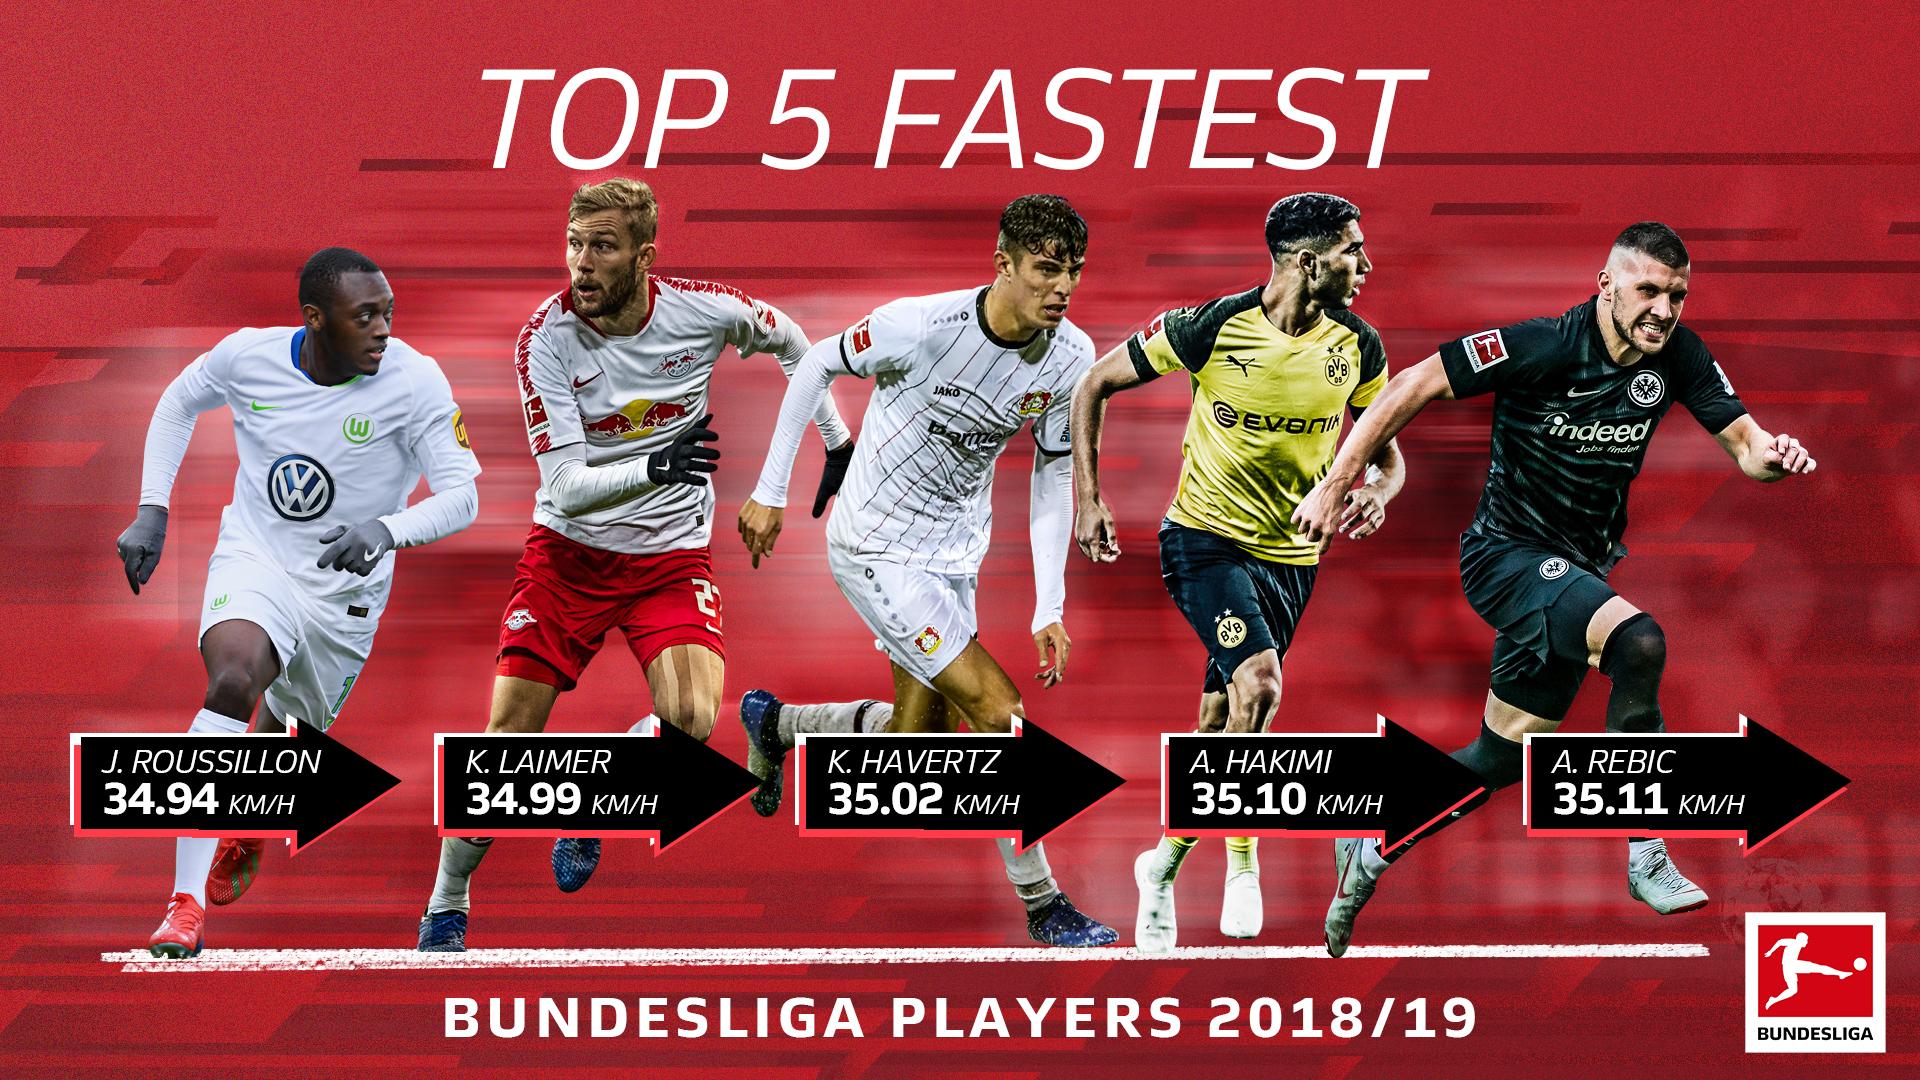 Speedy-Players.jpg